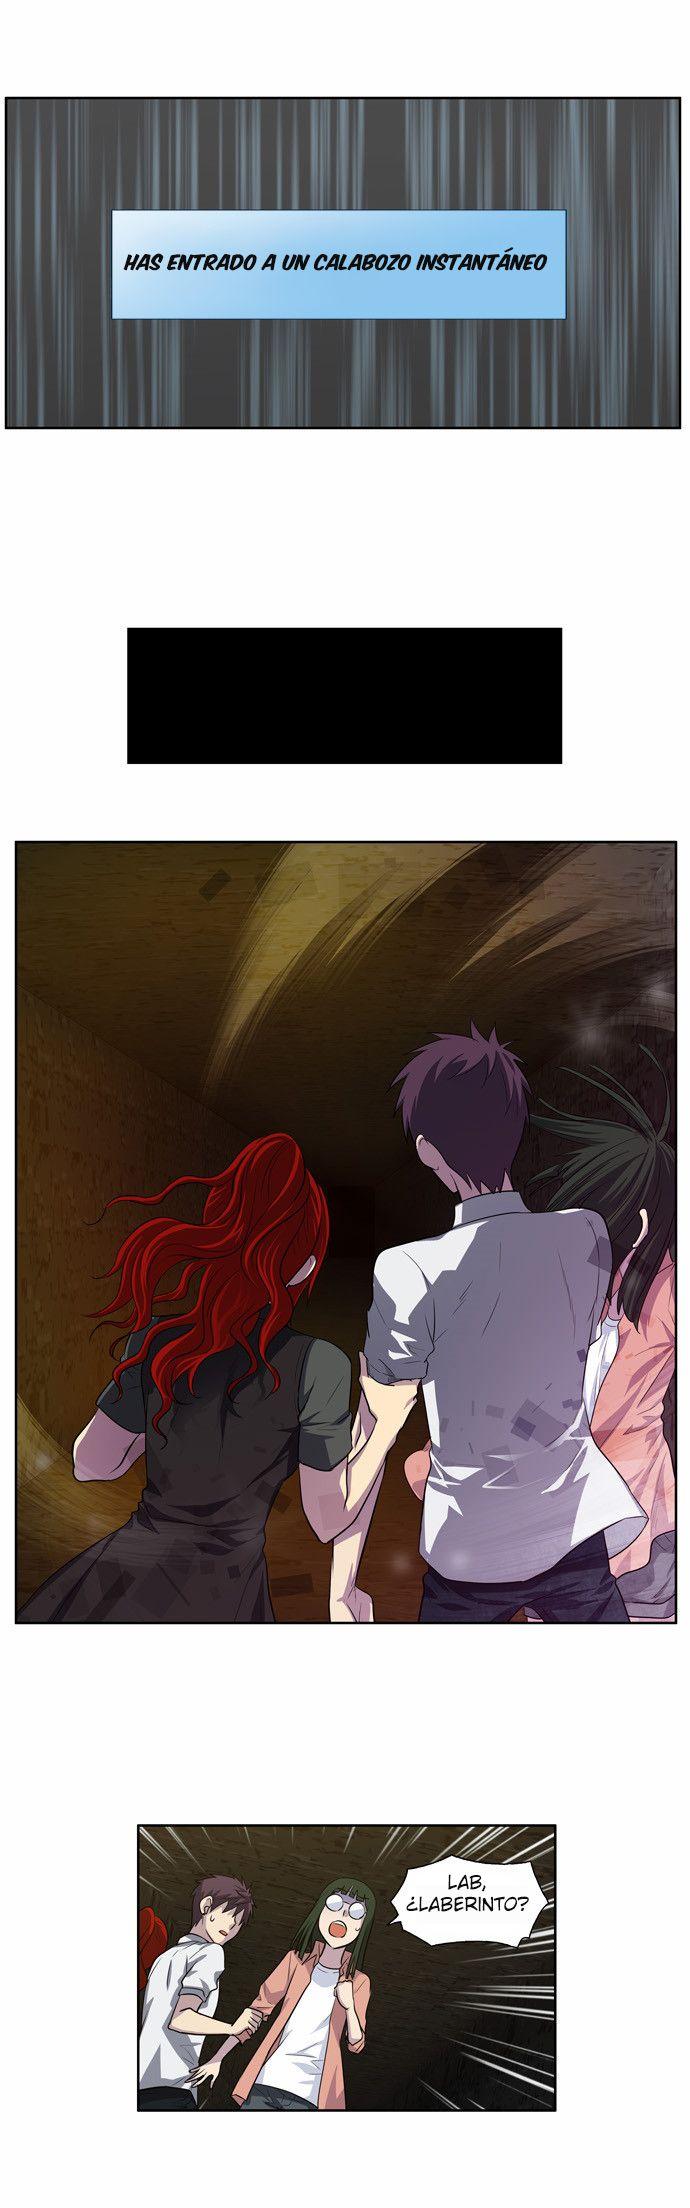 https://c5.ninemanga.com/es_manga/61/1725/478207/6f1d0705c91c2145201df18a1a0c7345.jpg Page 10